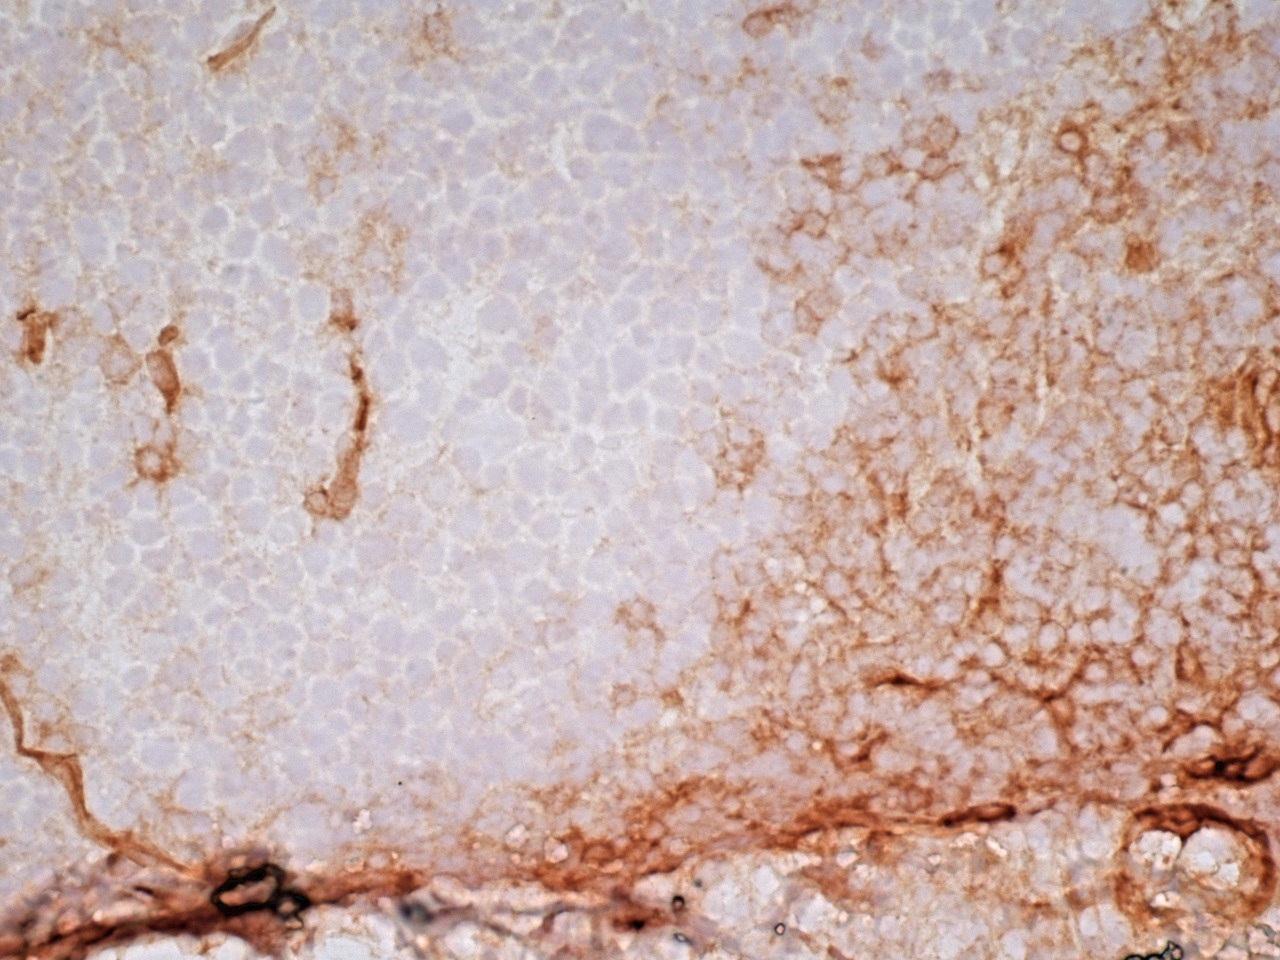 CD141 Antibody | QBEND/40 gallery image 6